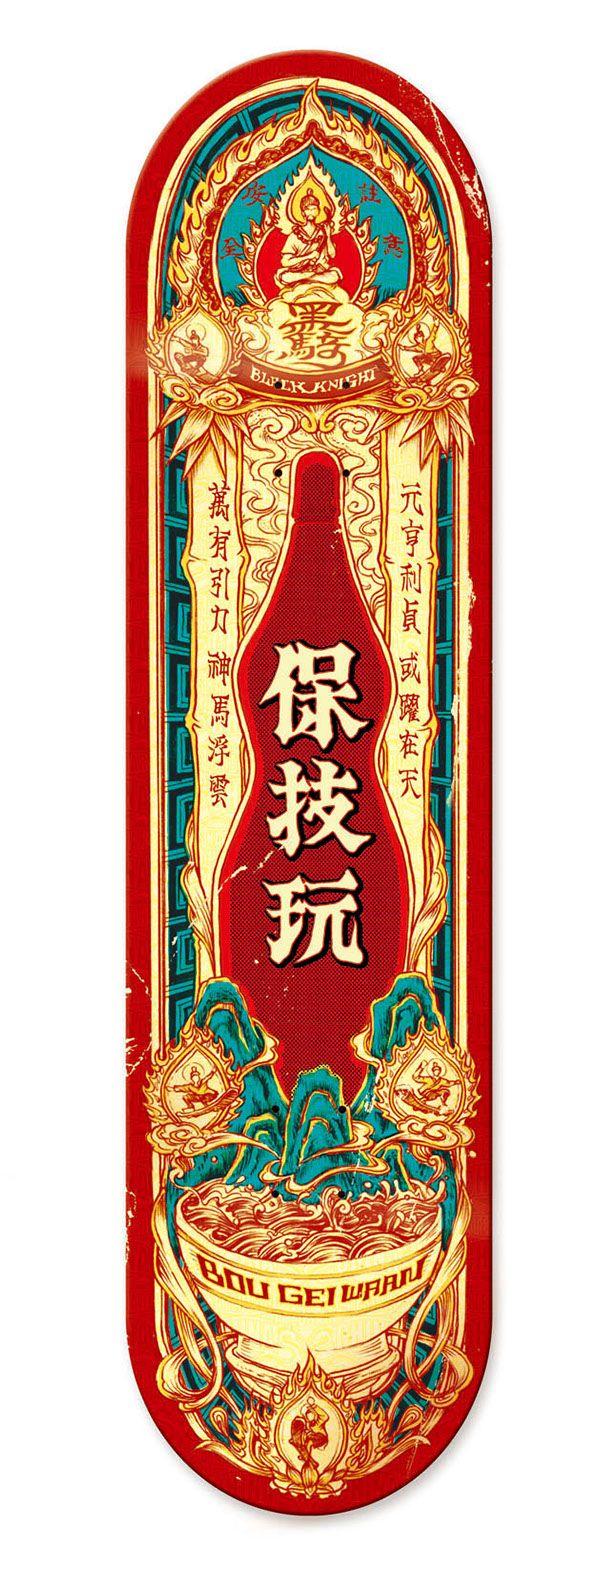 China skateboard design 保技玩 Bon Gei Waan (Skill player) http://www.chinaskateboards.cn/ #design #china #skateboards